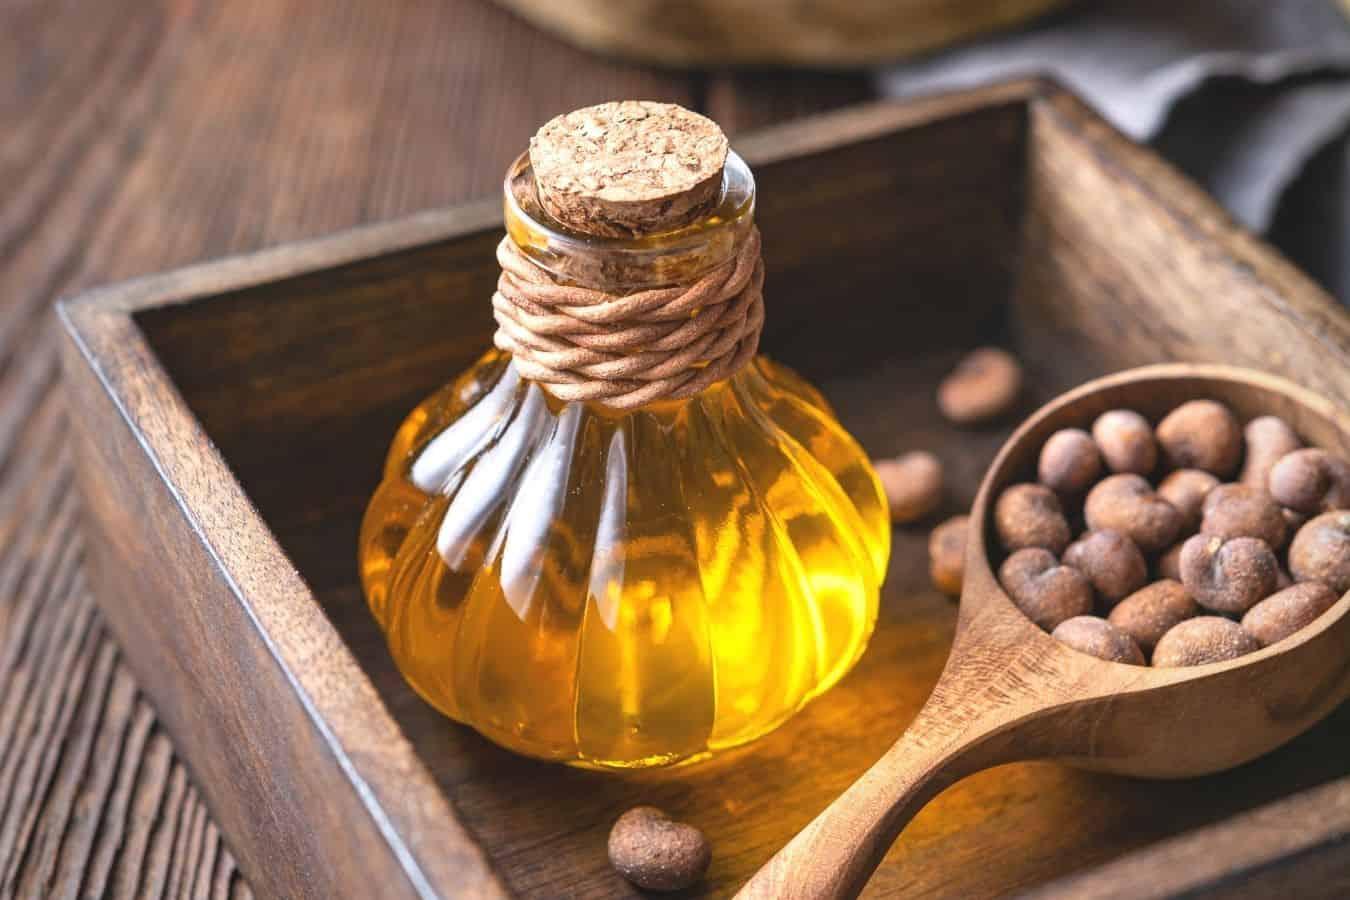 Baobab Oil For Hair Growth